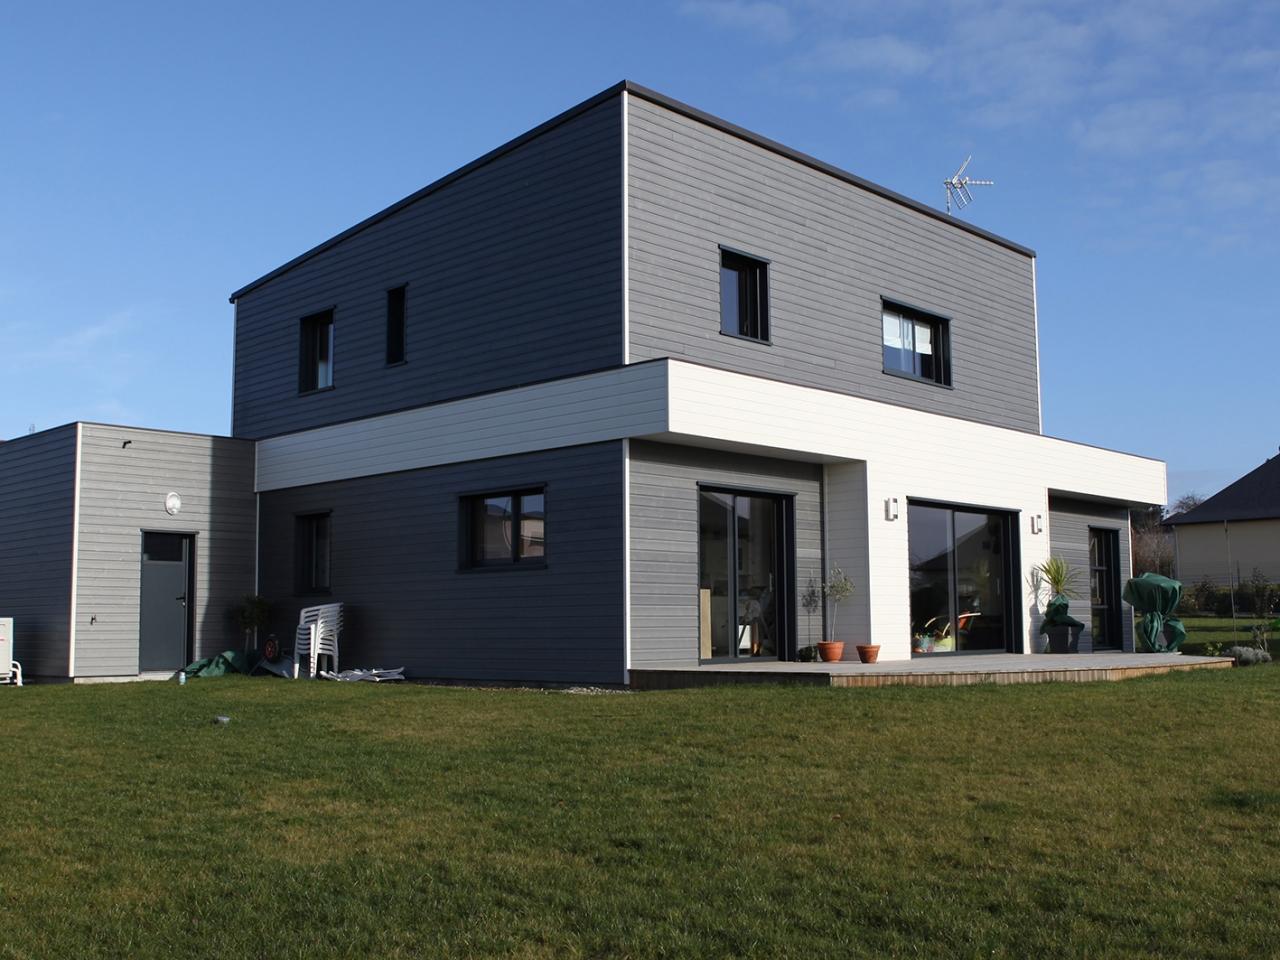 DEROUET constructeur de maison bois en Mayenne (53), expert ...